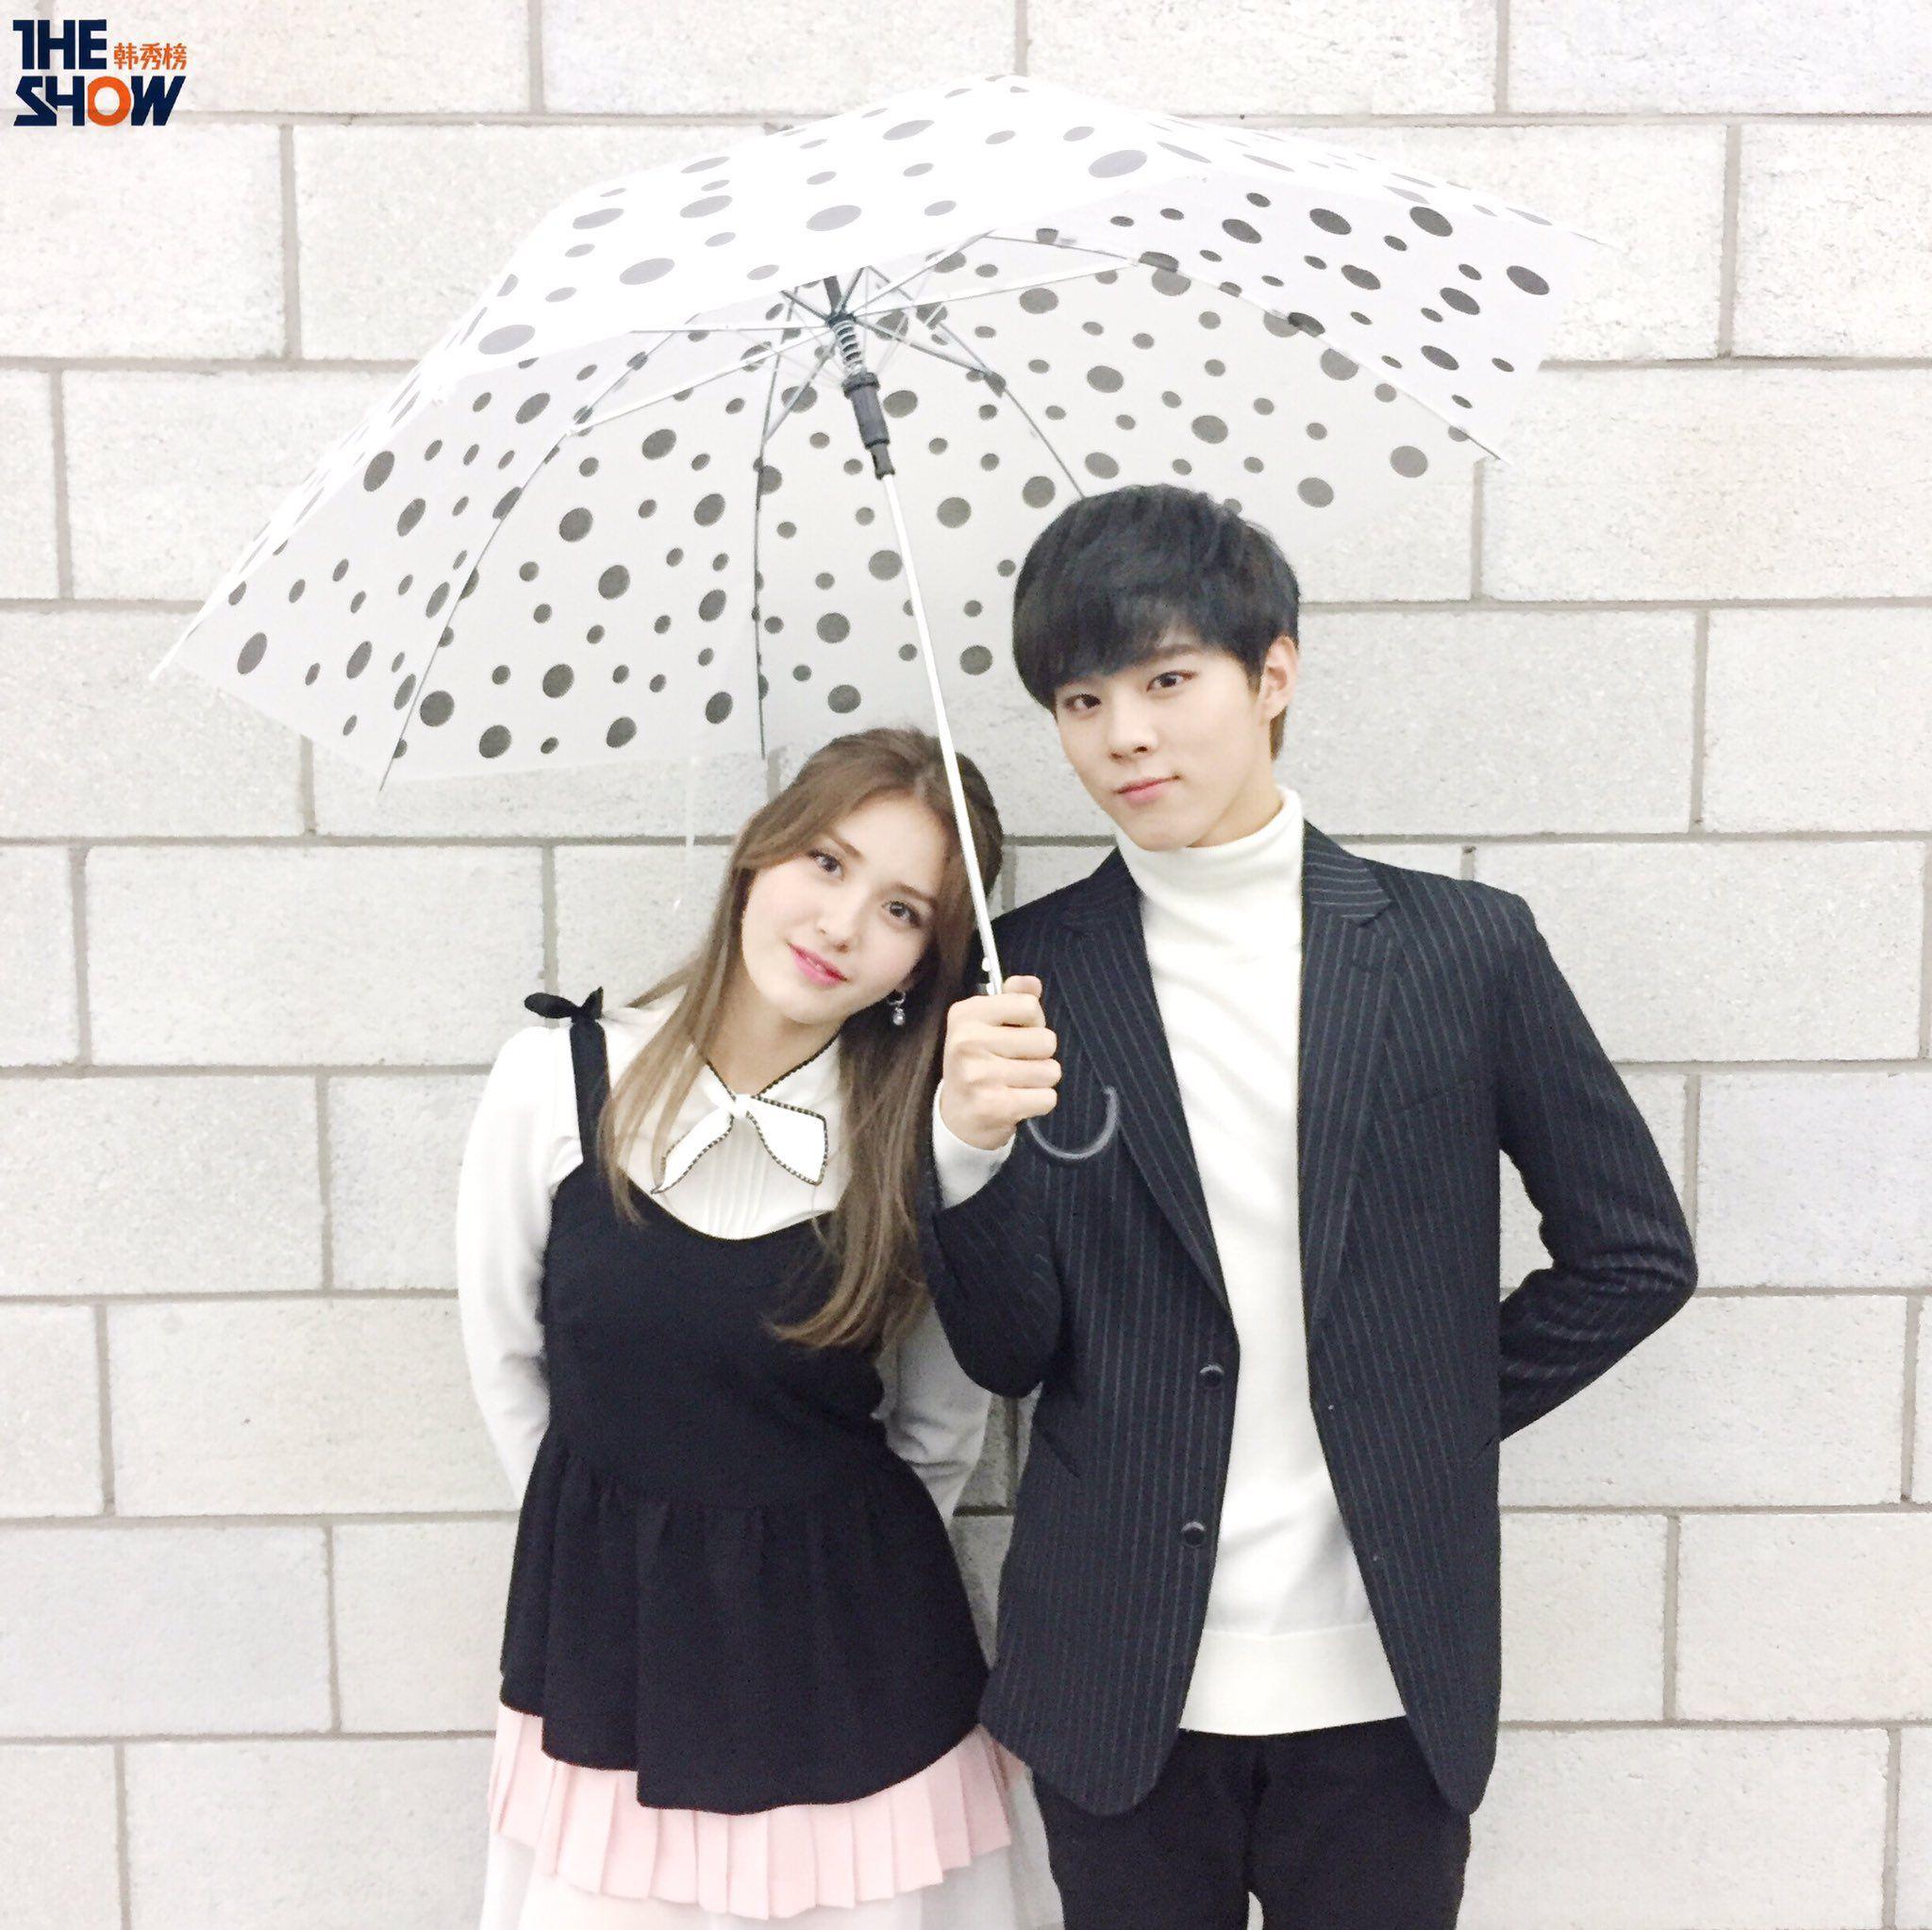 161024 UP10TION Wooshin & IOI Somi #IOI #Somi #THESHOW #THESHOW韩秀榜 #UP10TION #업텐션 #Wooshin #우신